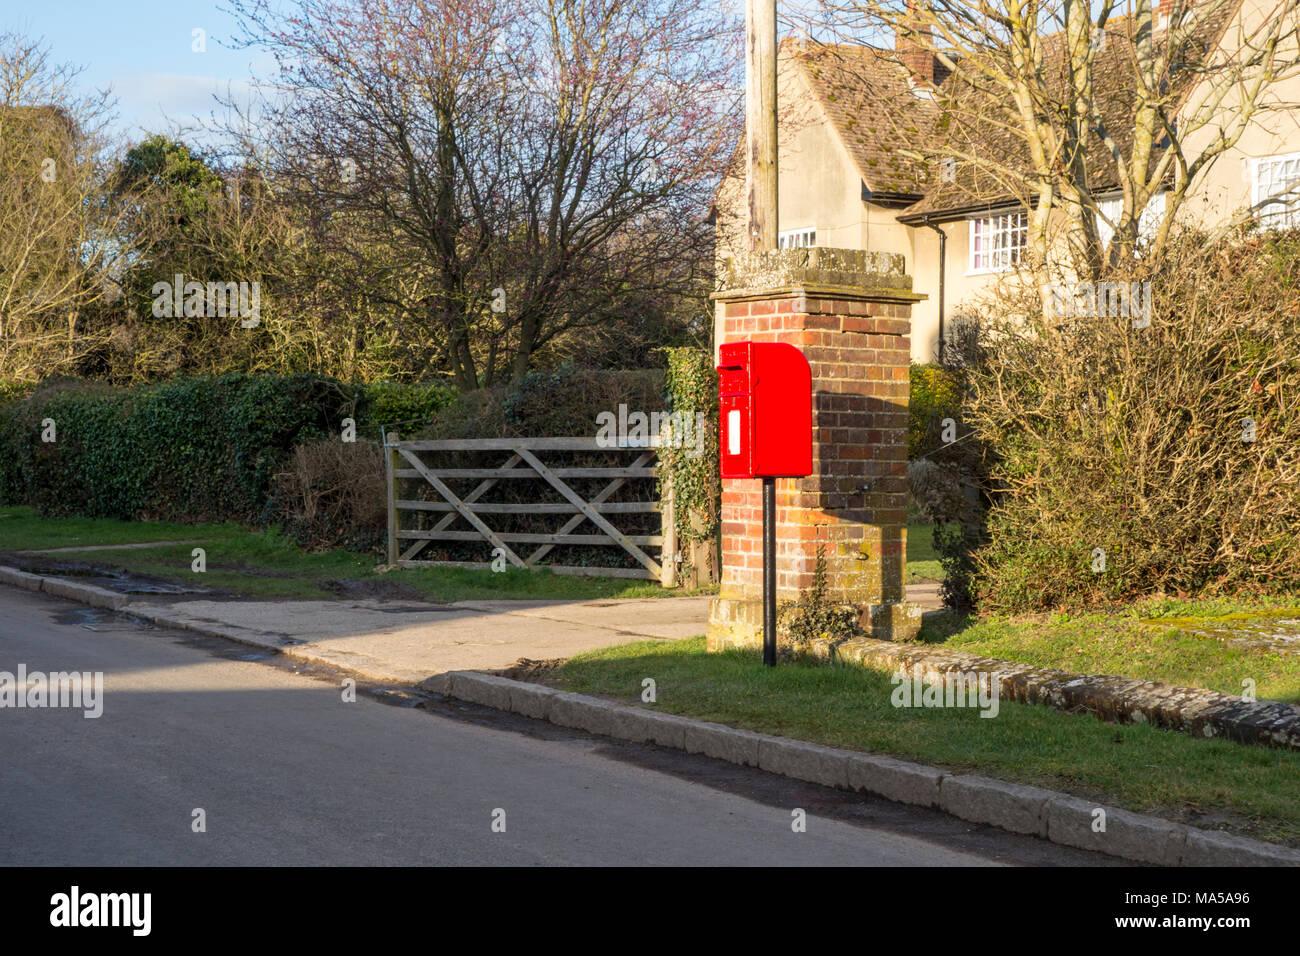 English village red post box, Hexton, Hertfordshire, UK - Stock Image